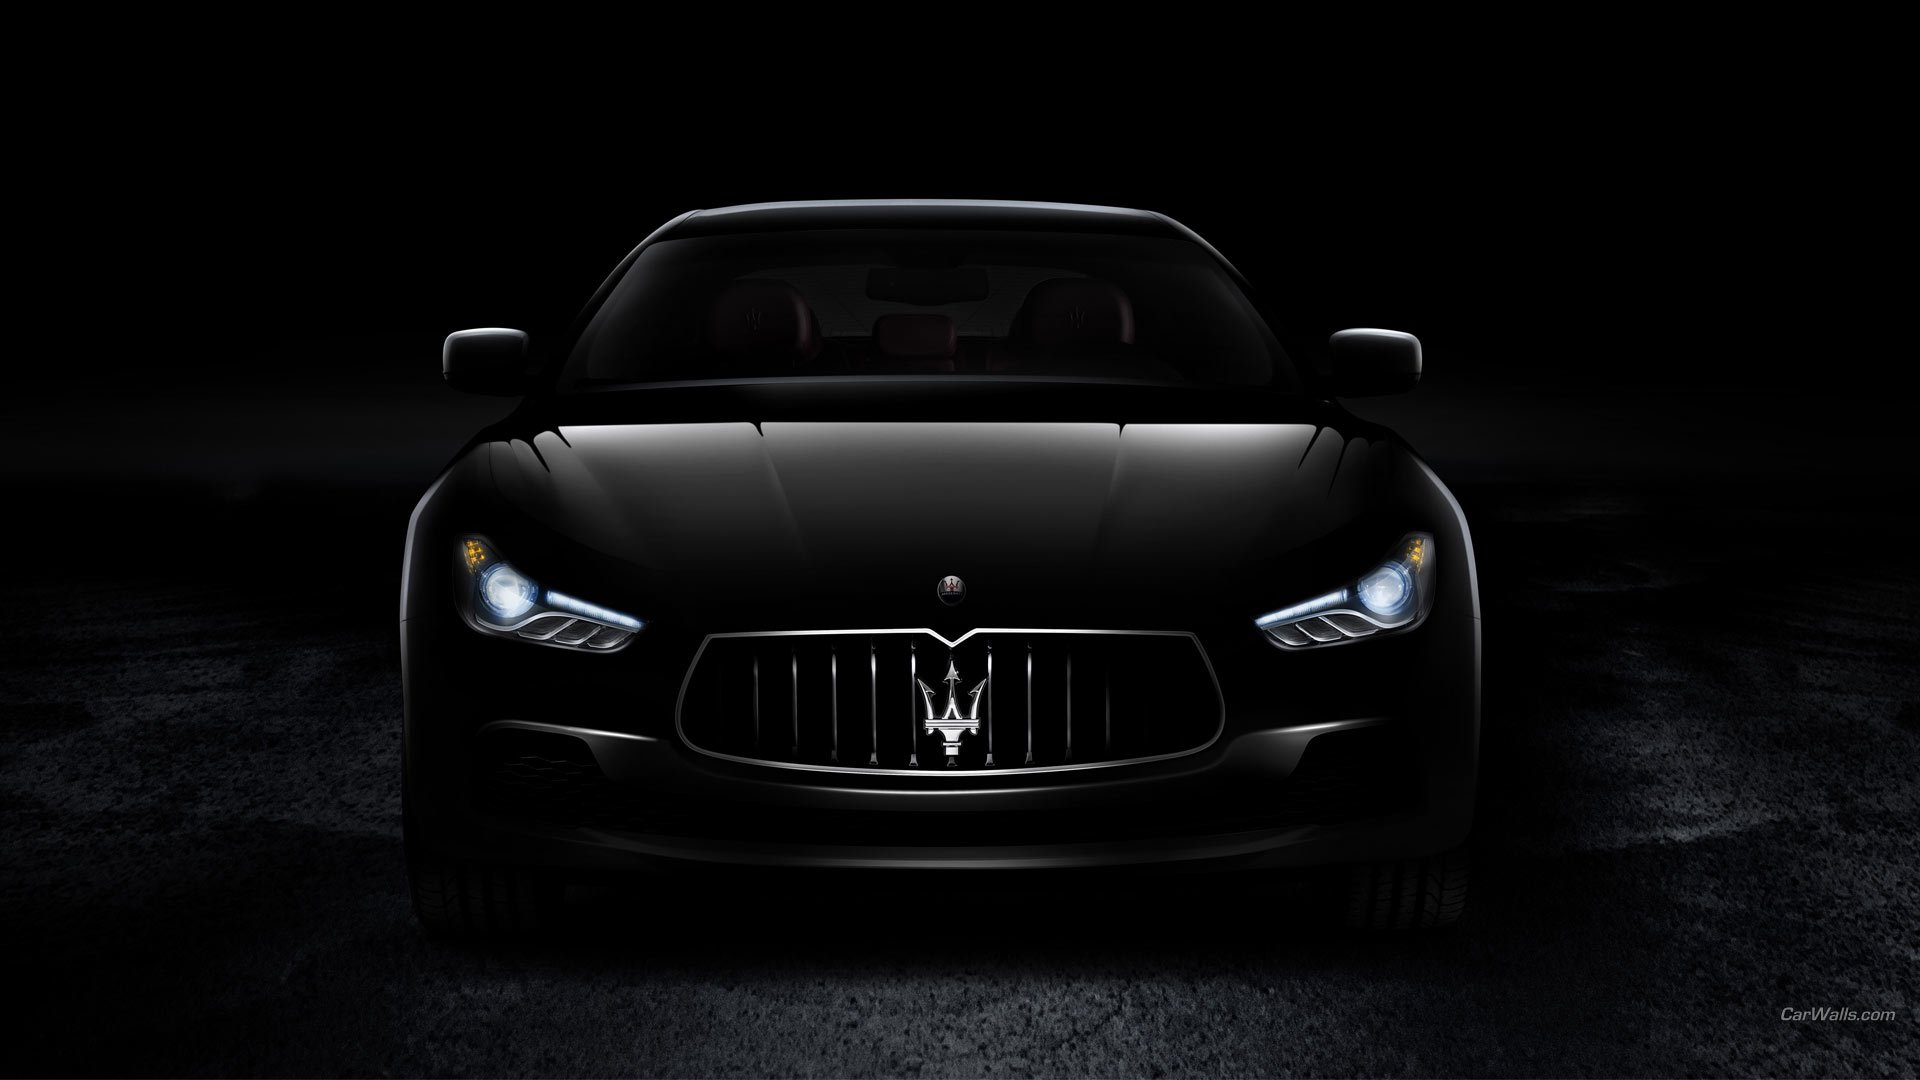 Maserati Ghibli HD Wallpaper Background Image 1920x1080 ID 1920x1080